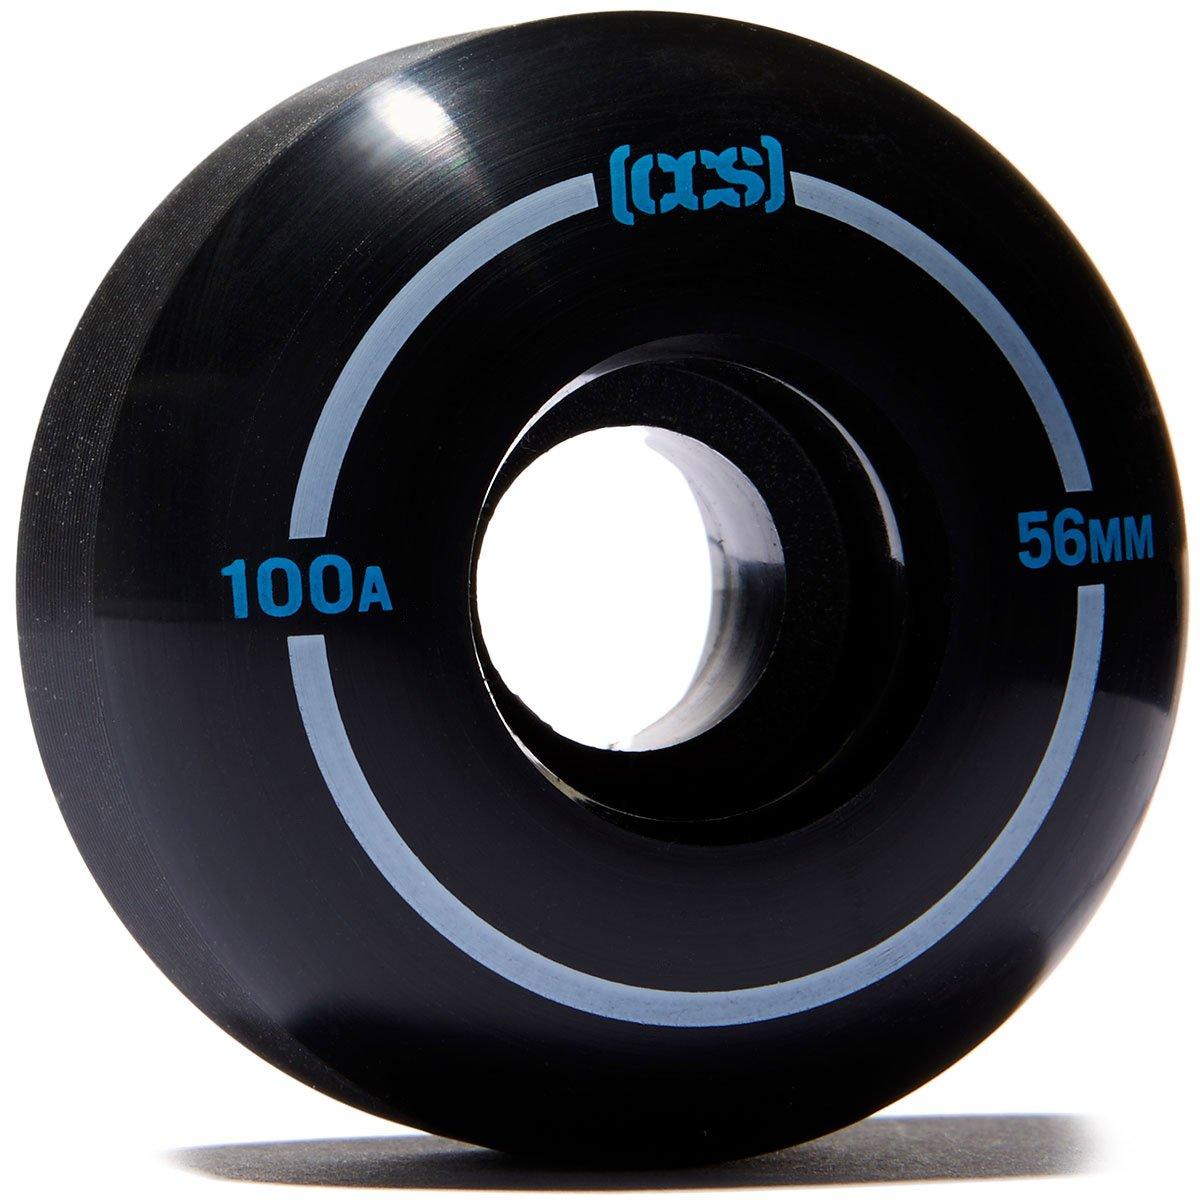 CCS Skateboard Wheels - Multiple Colors (Black, 56mm) by CCS